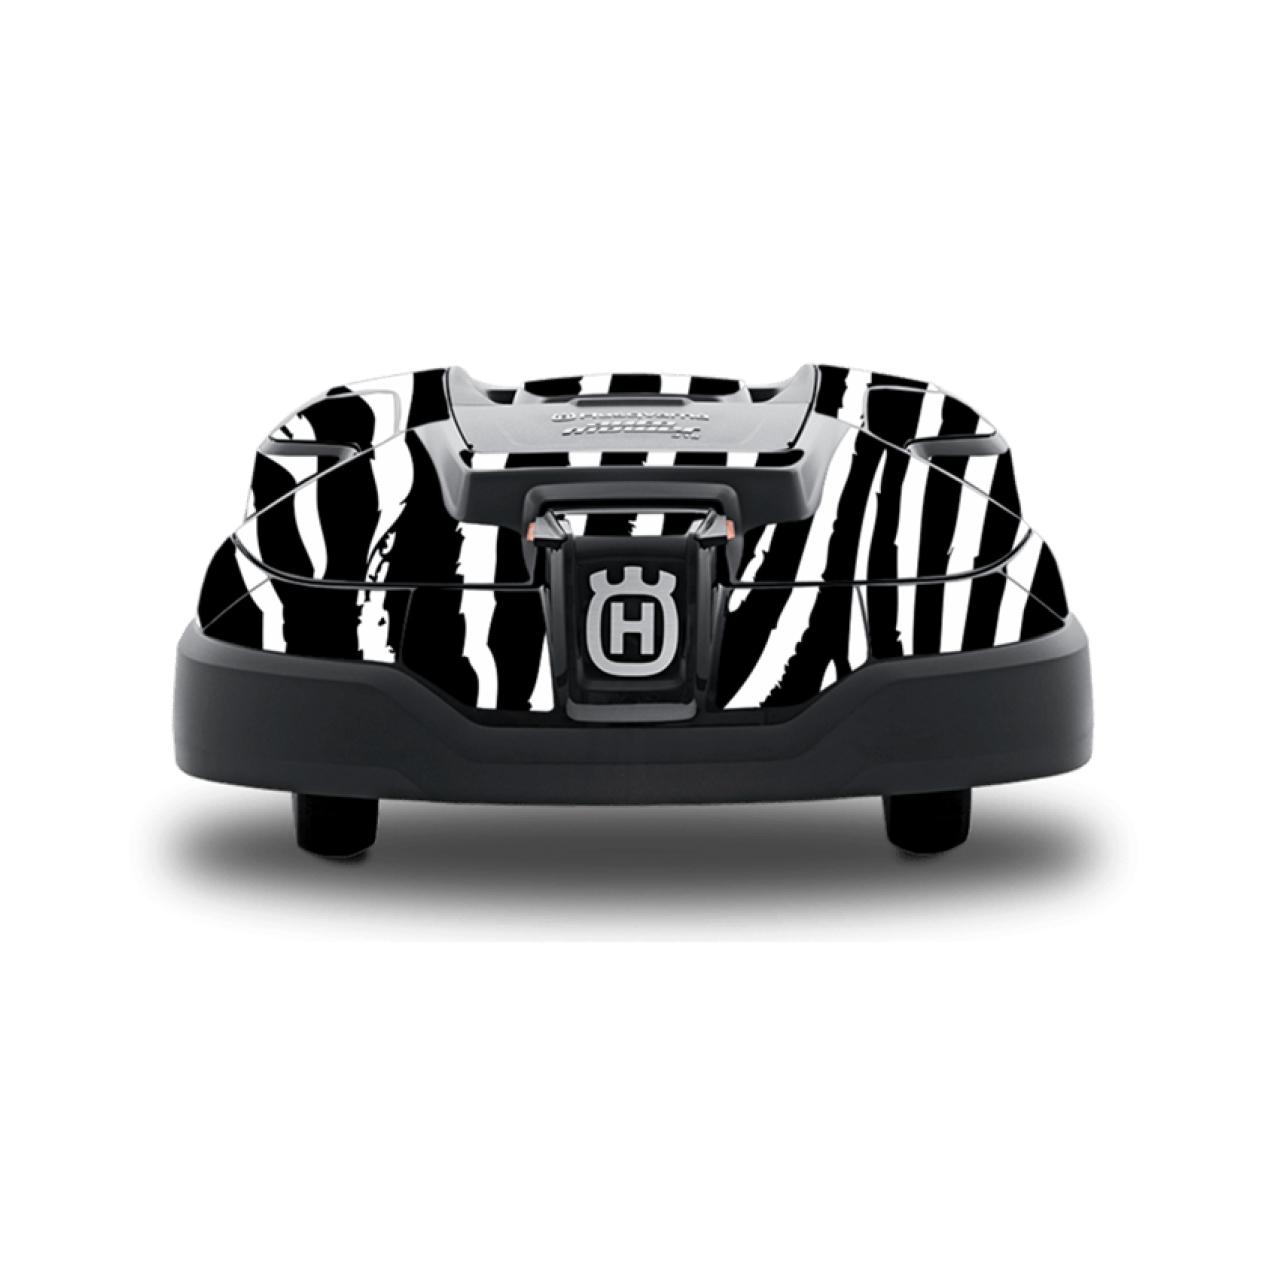 Sticker-Set Zebra (320/420/440)